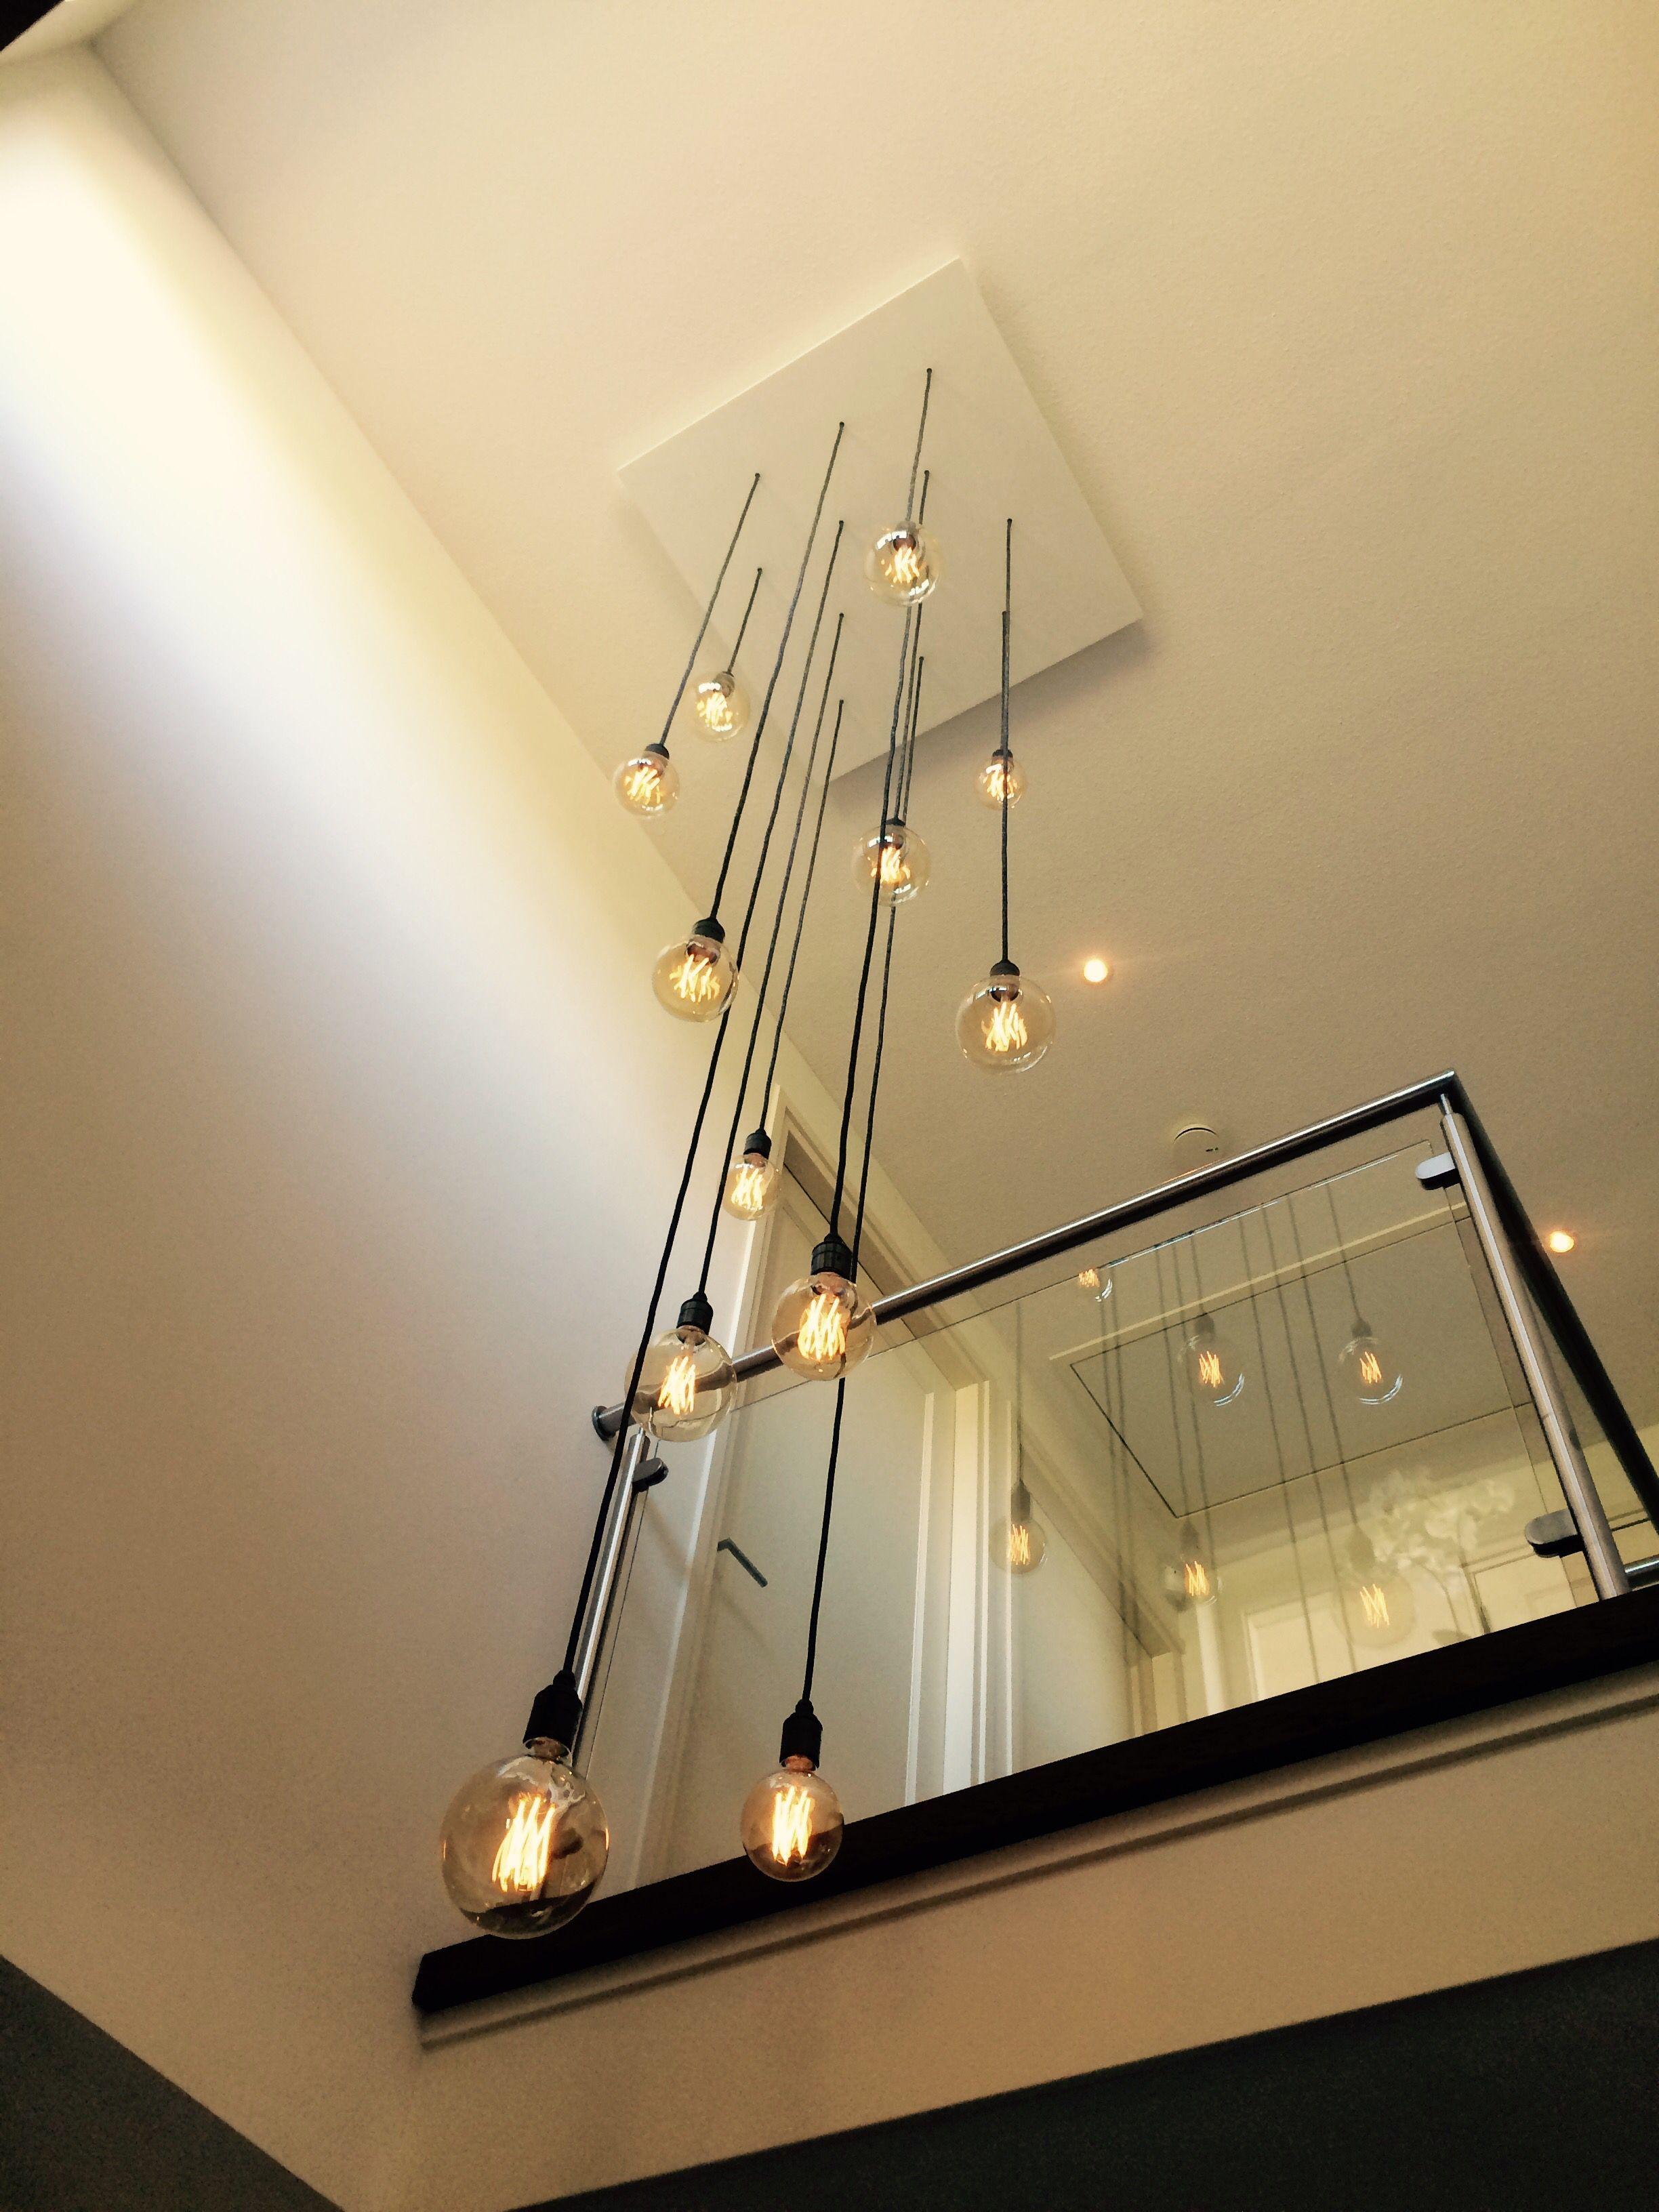 Hanglamp Vide In 2020 Stairway Lighting Staircase Lighting